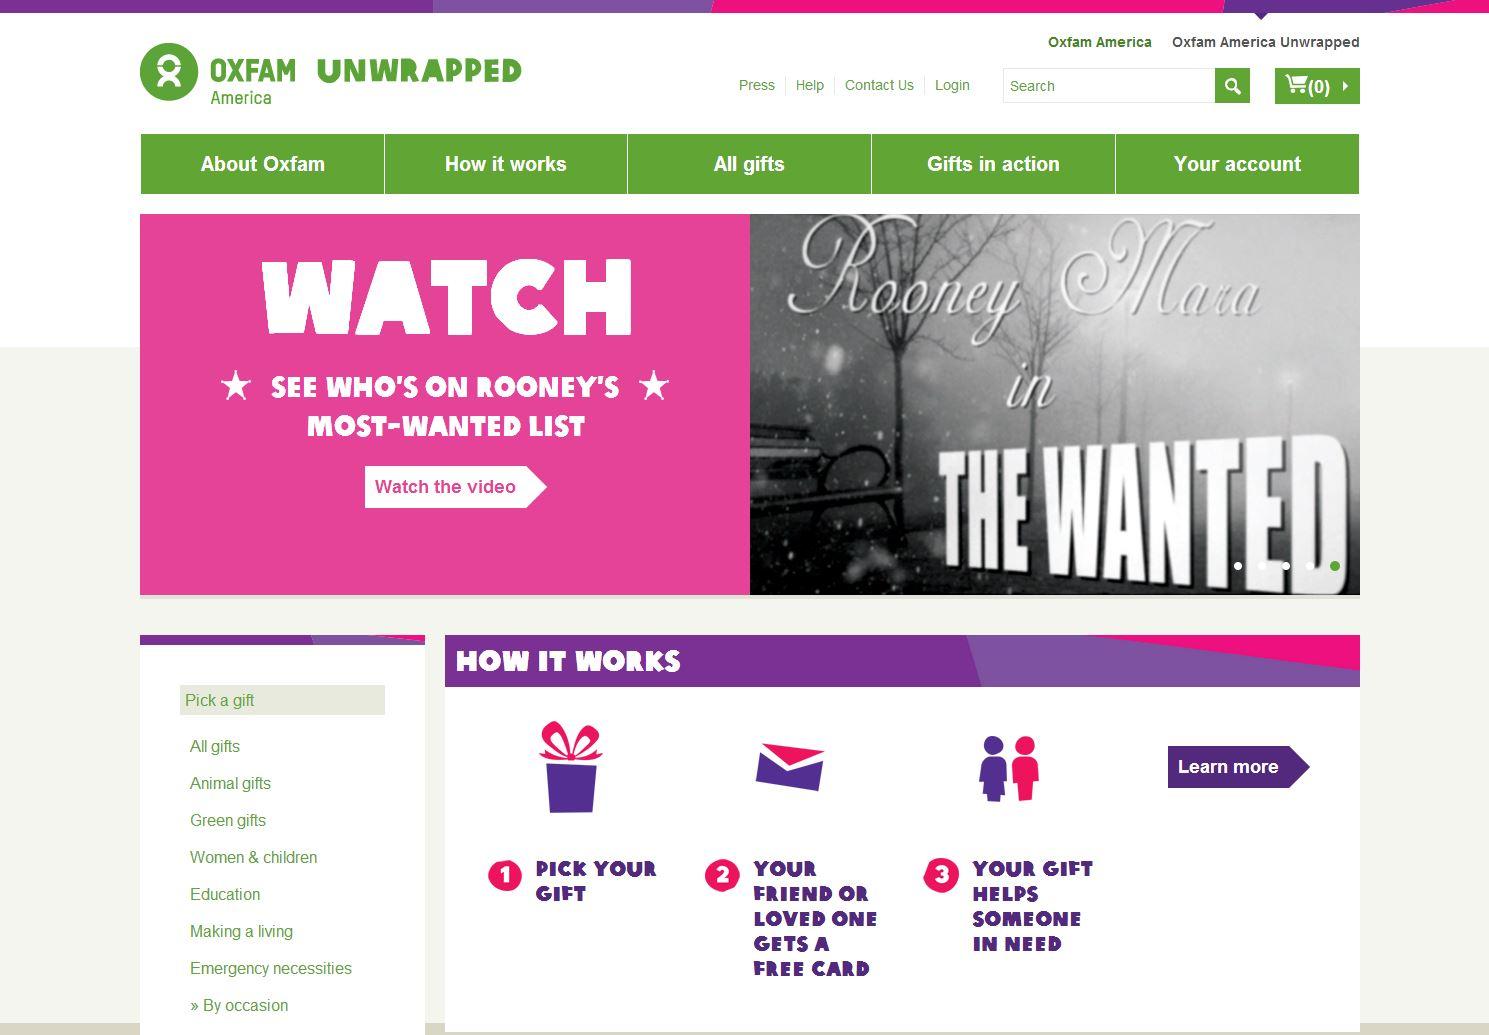 OxfamGifts.com